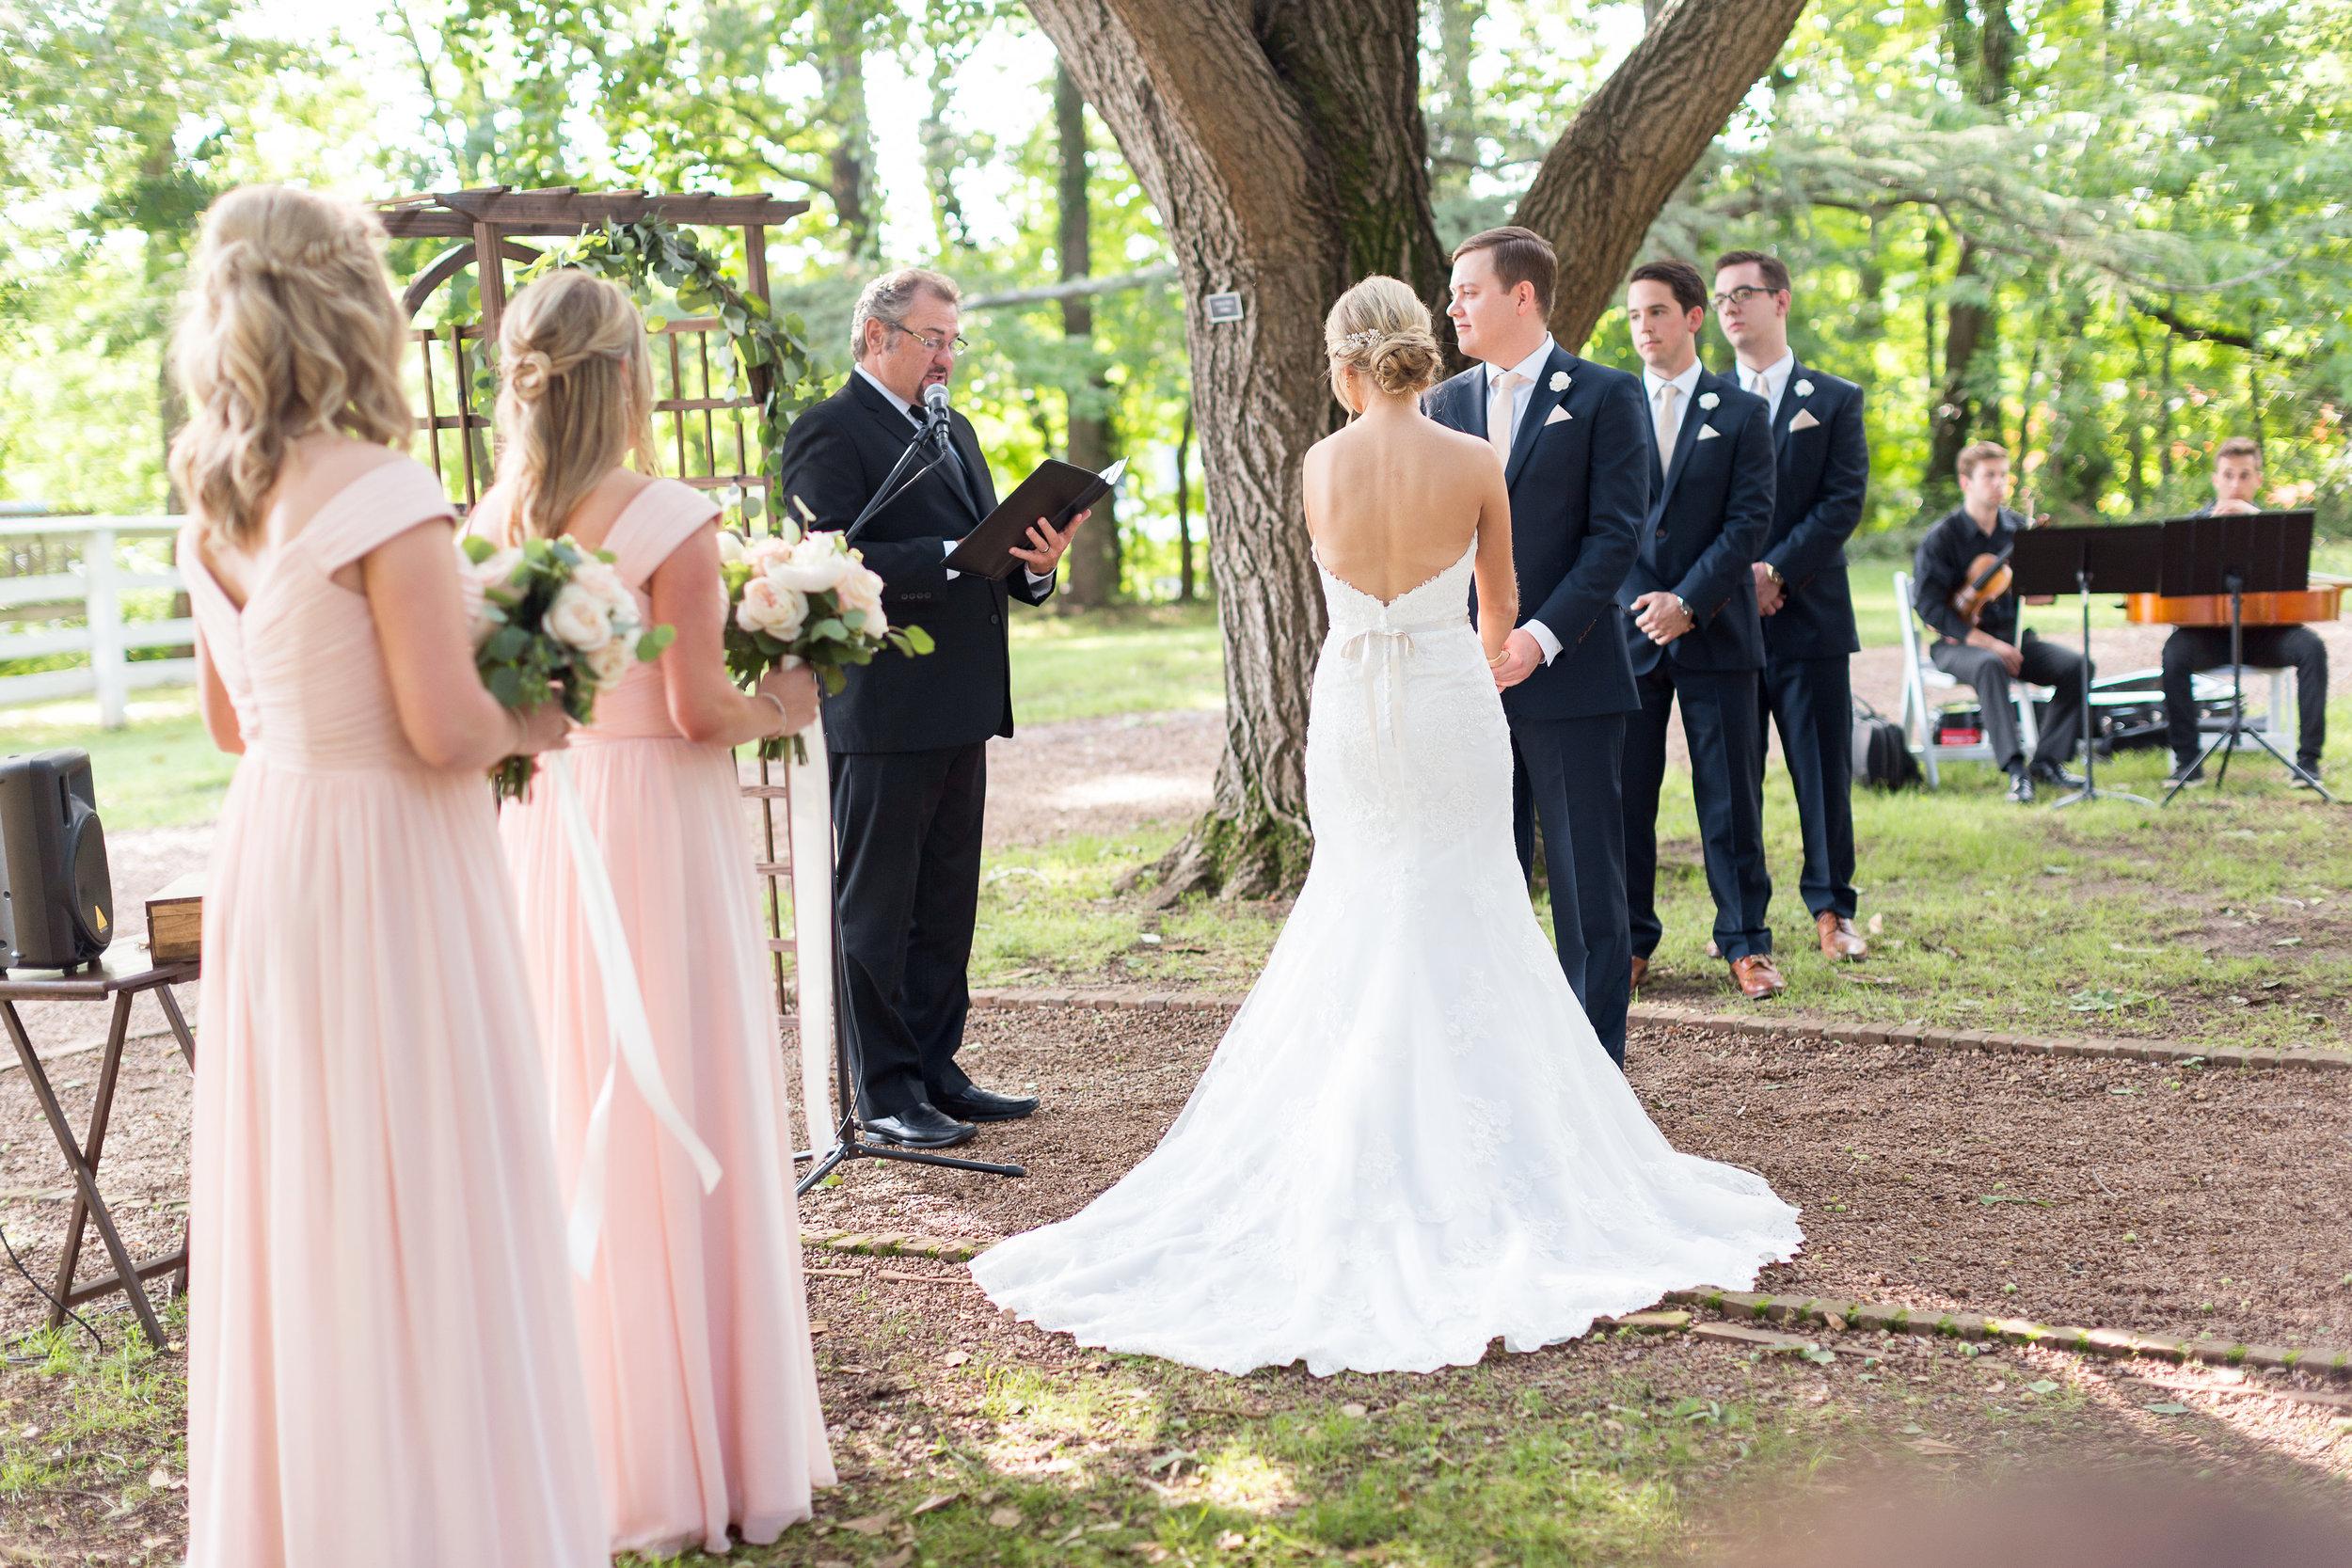 Swords_wedding-303.jpg